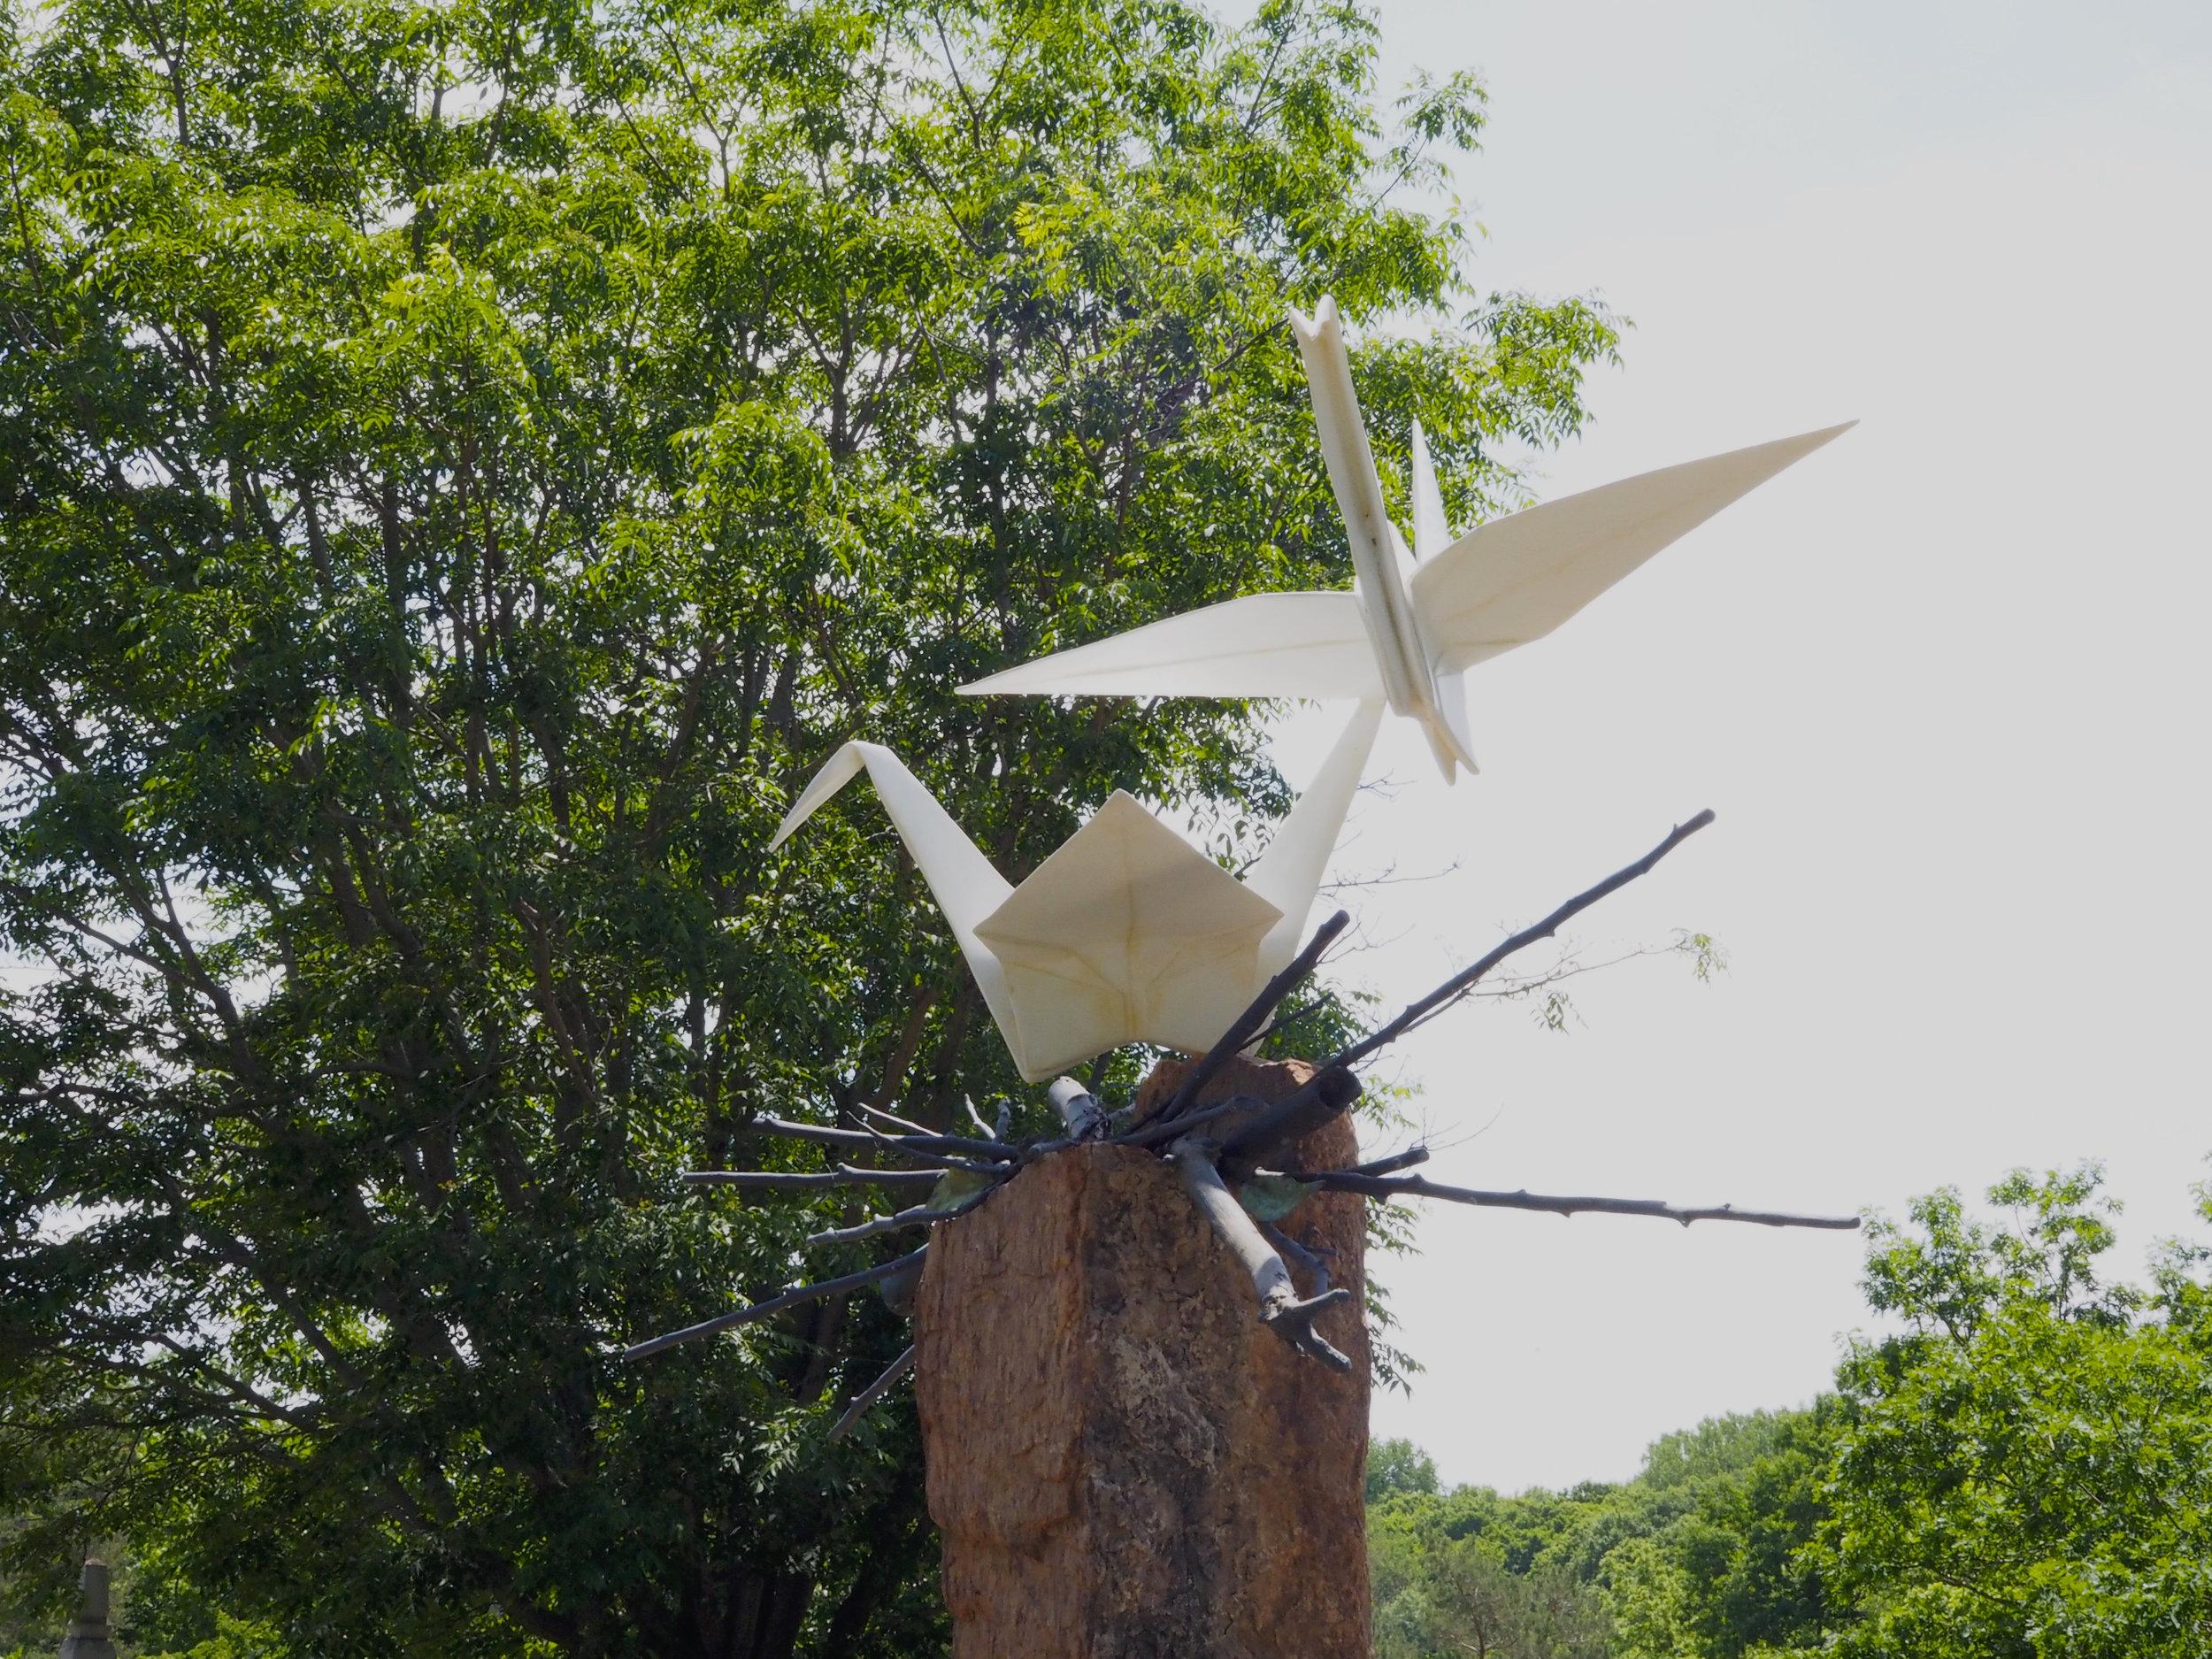 cindi_arboretum_origami_spiritedtable_photo21.jpg